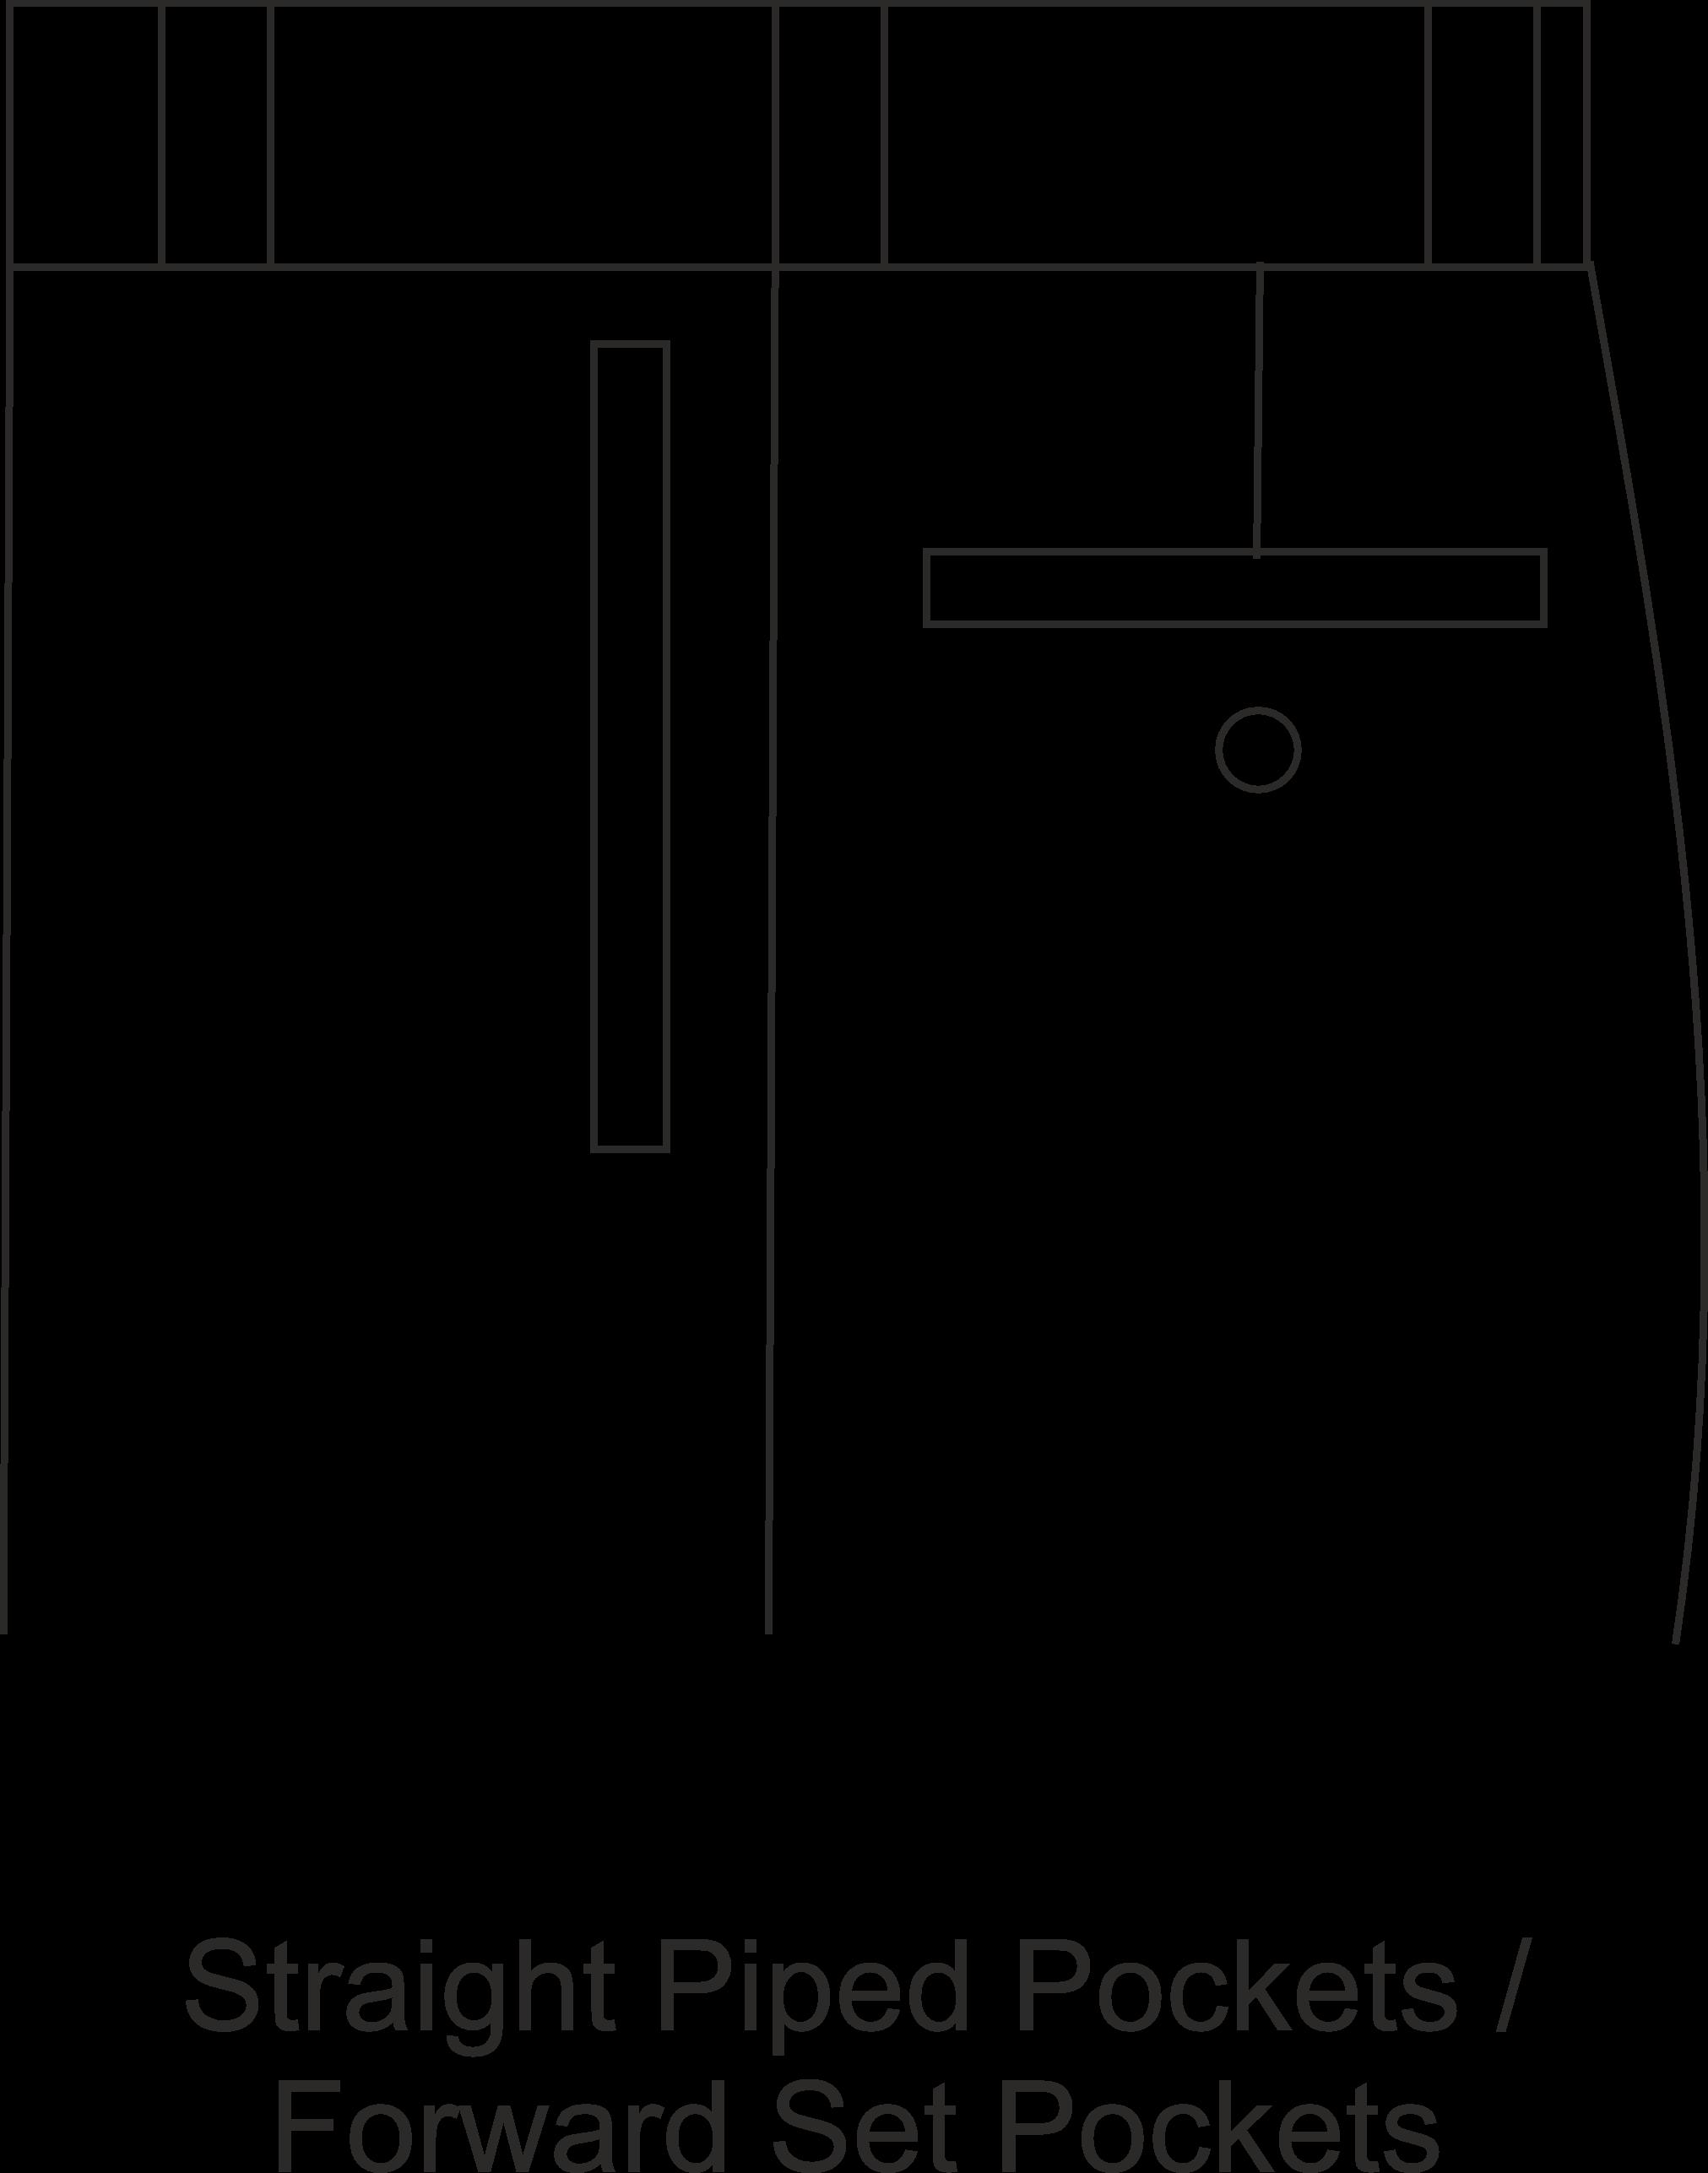 pockets-forward-set